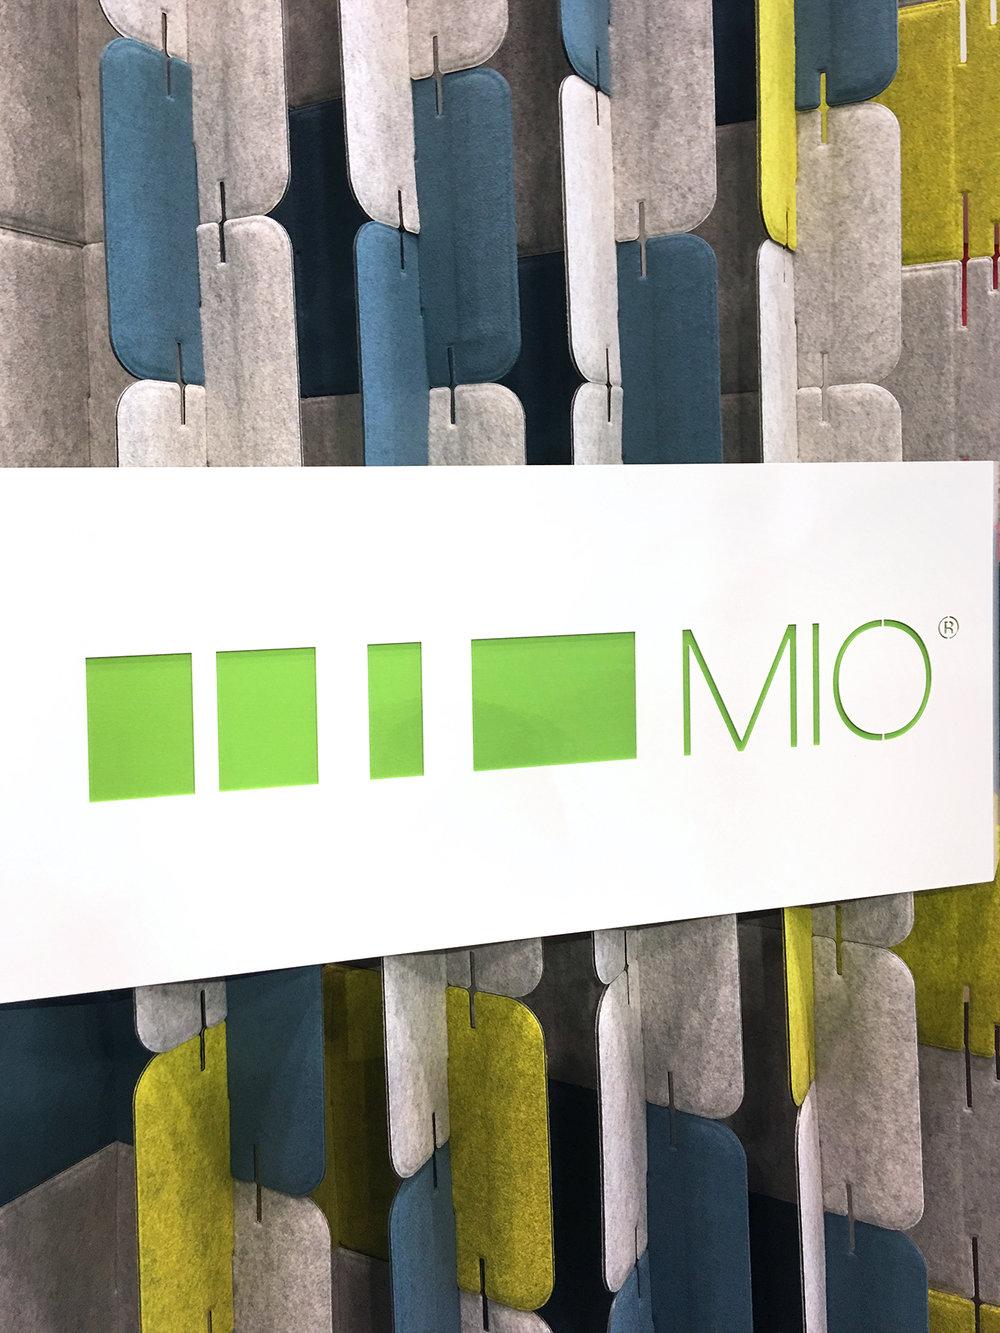 MIO. Modular wall system